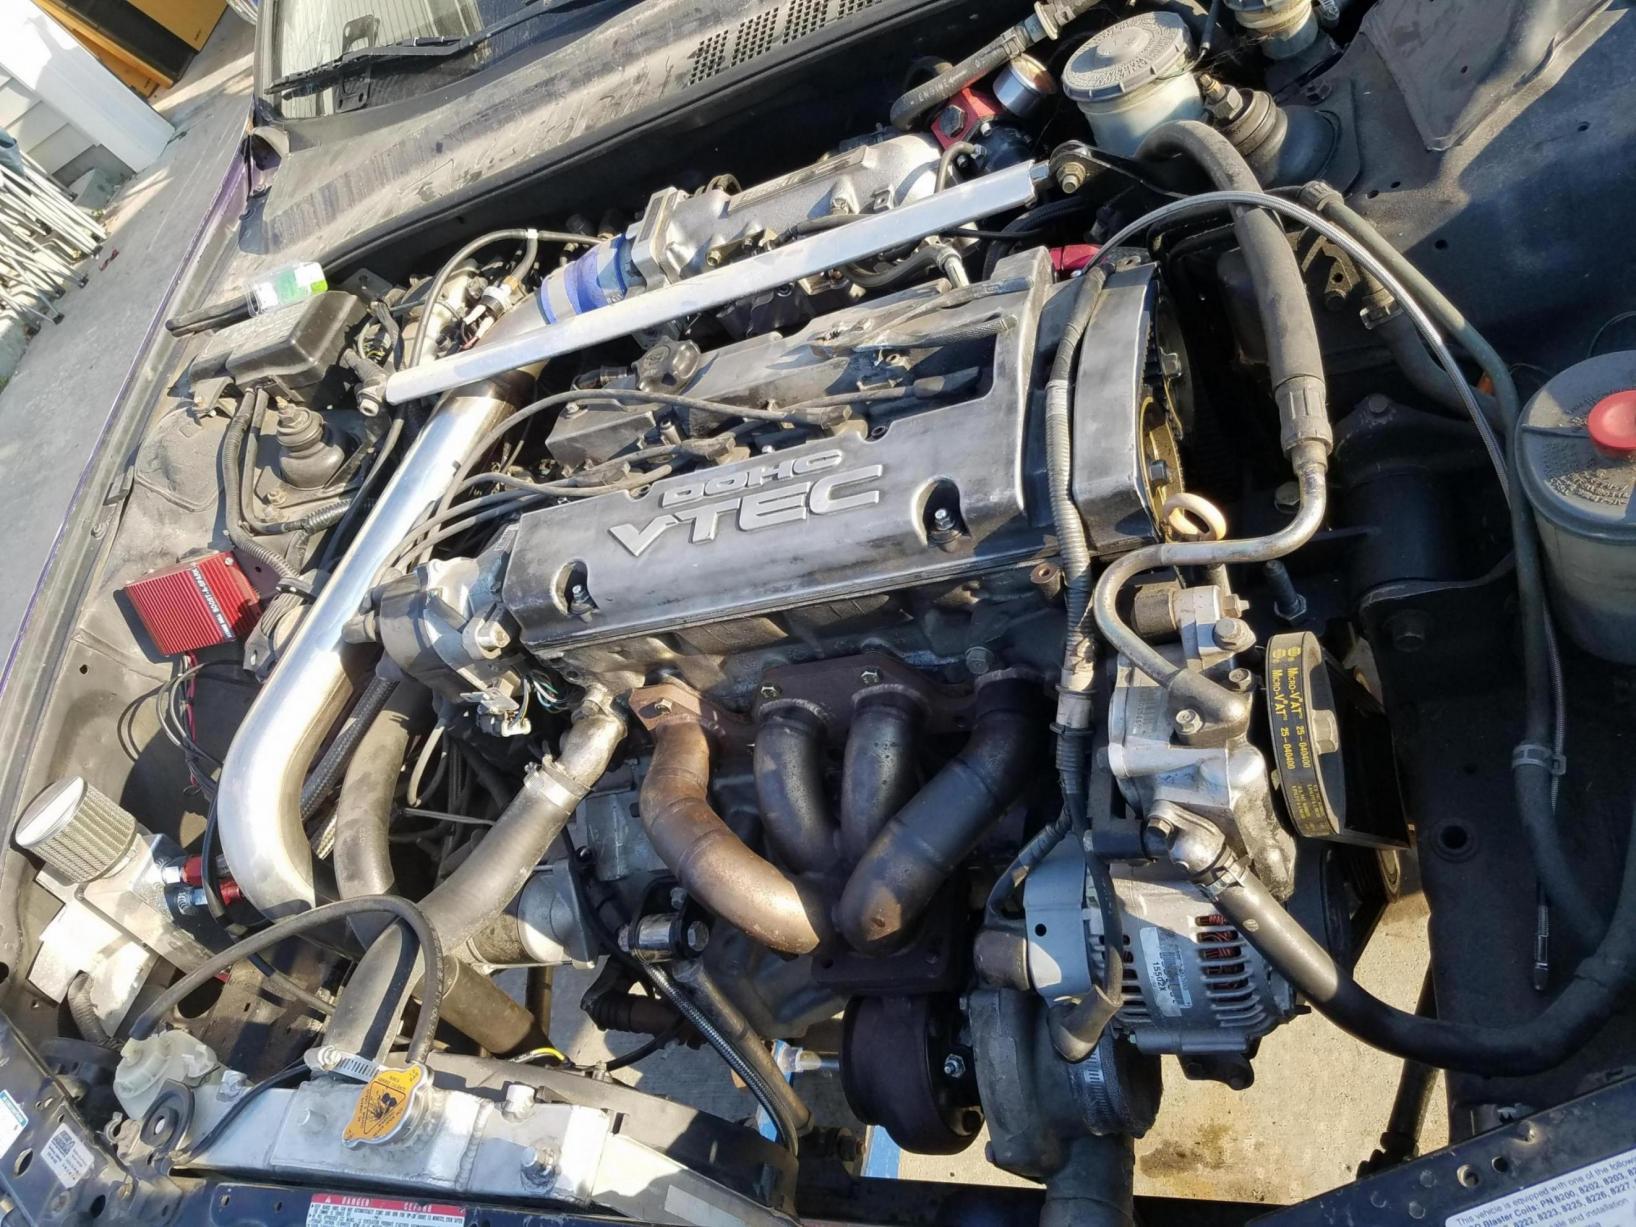 My h23Vtec turbo project-20170710_192050_1558360465660.jpg